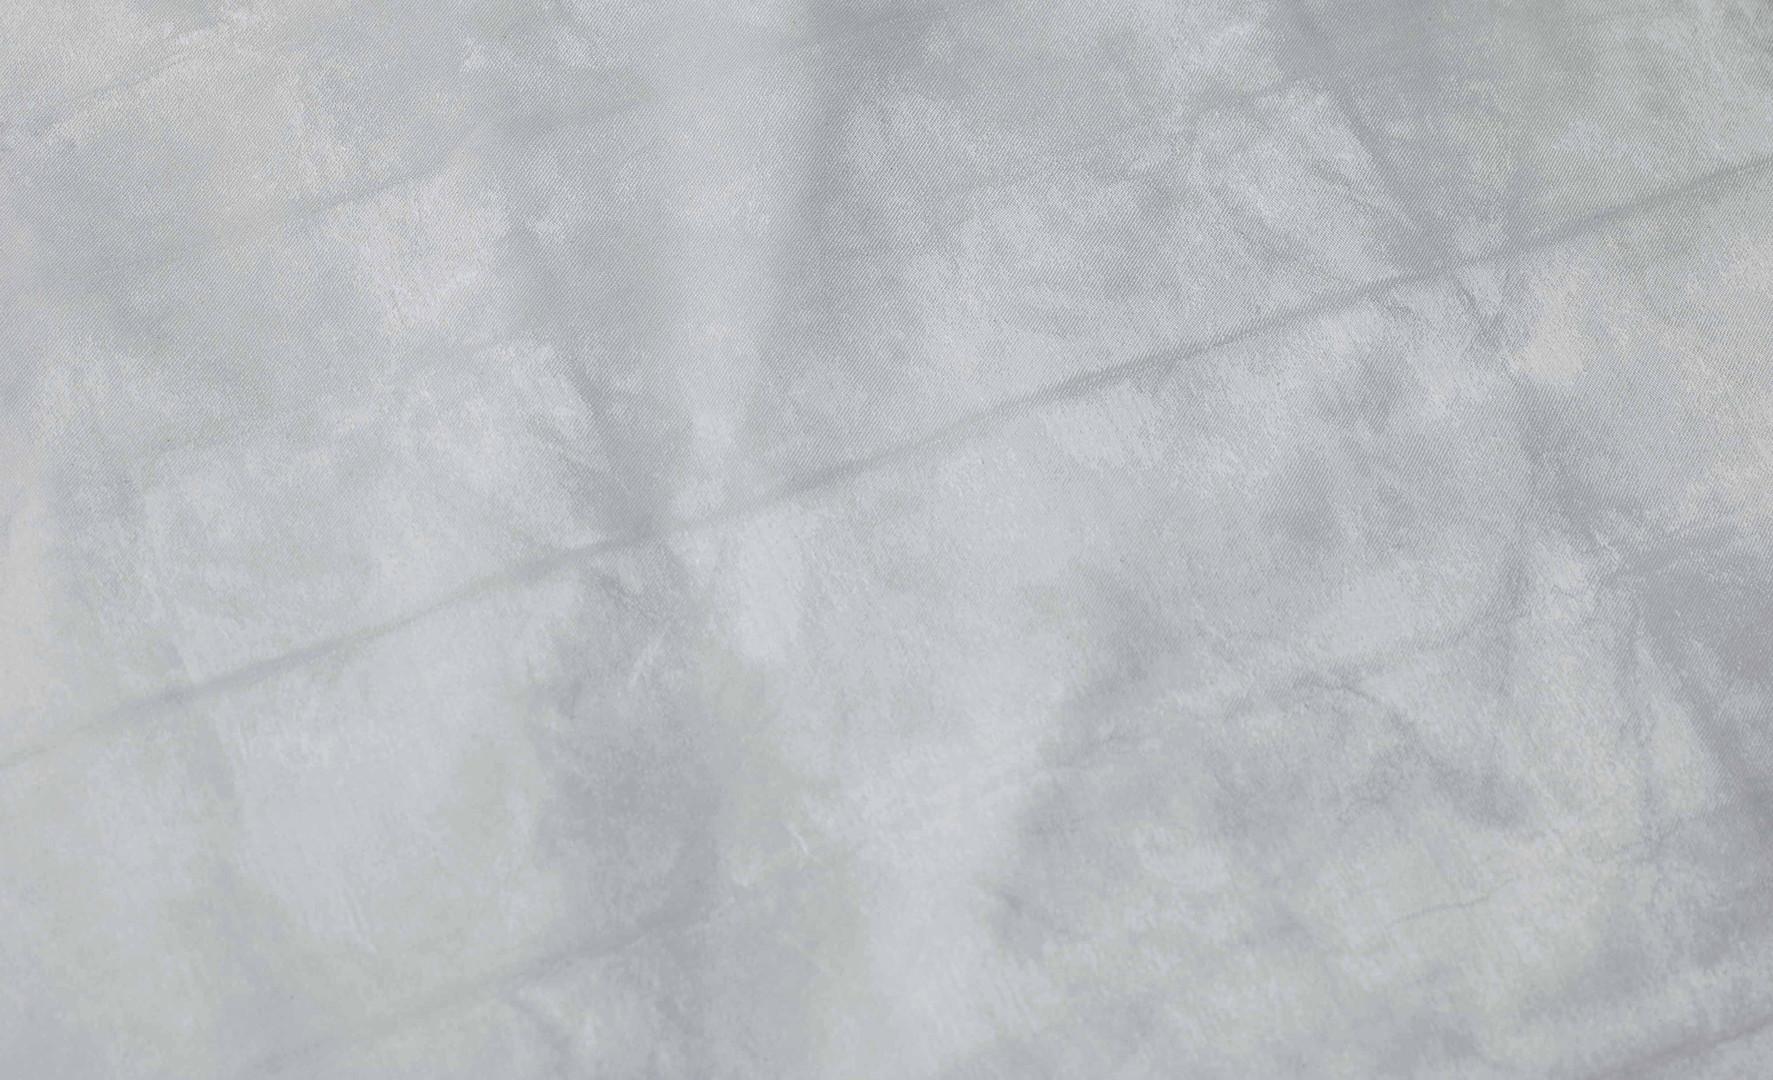 1804_Cracks_0143_silver-Detail.jpg